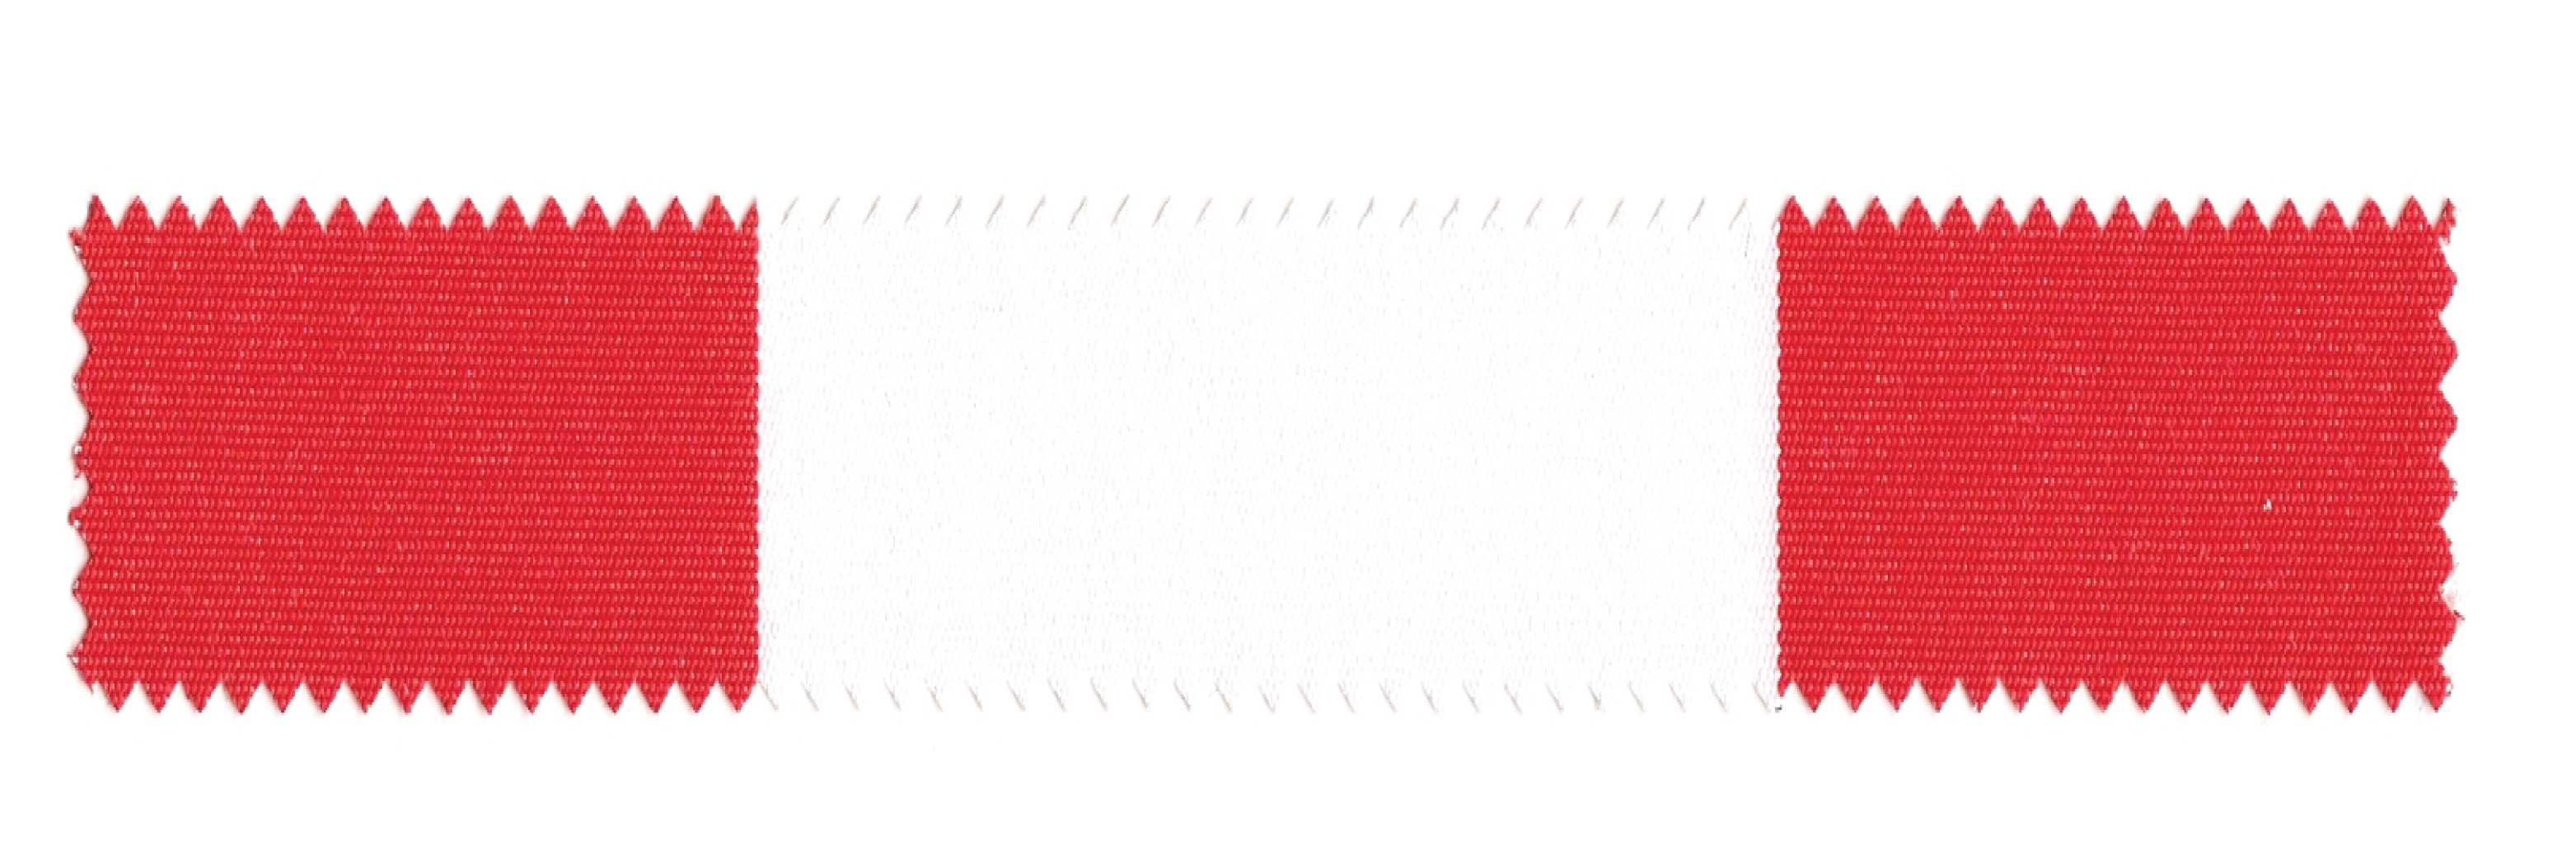 SATTLER ELEMENTS BLOCK STRIPES Red-White